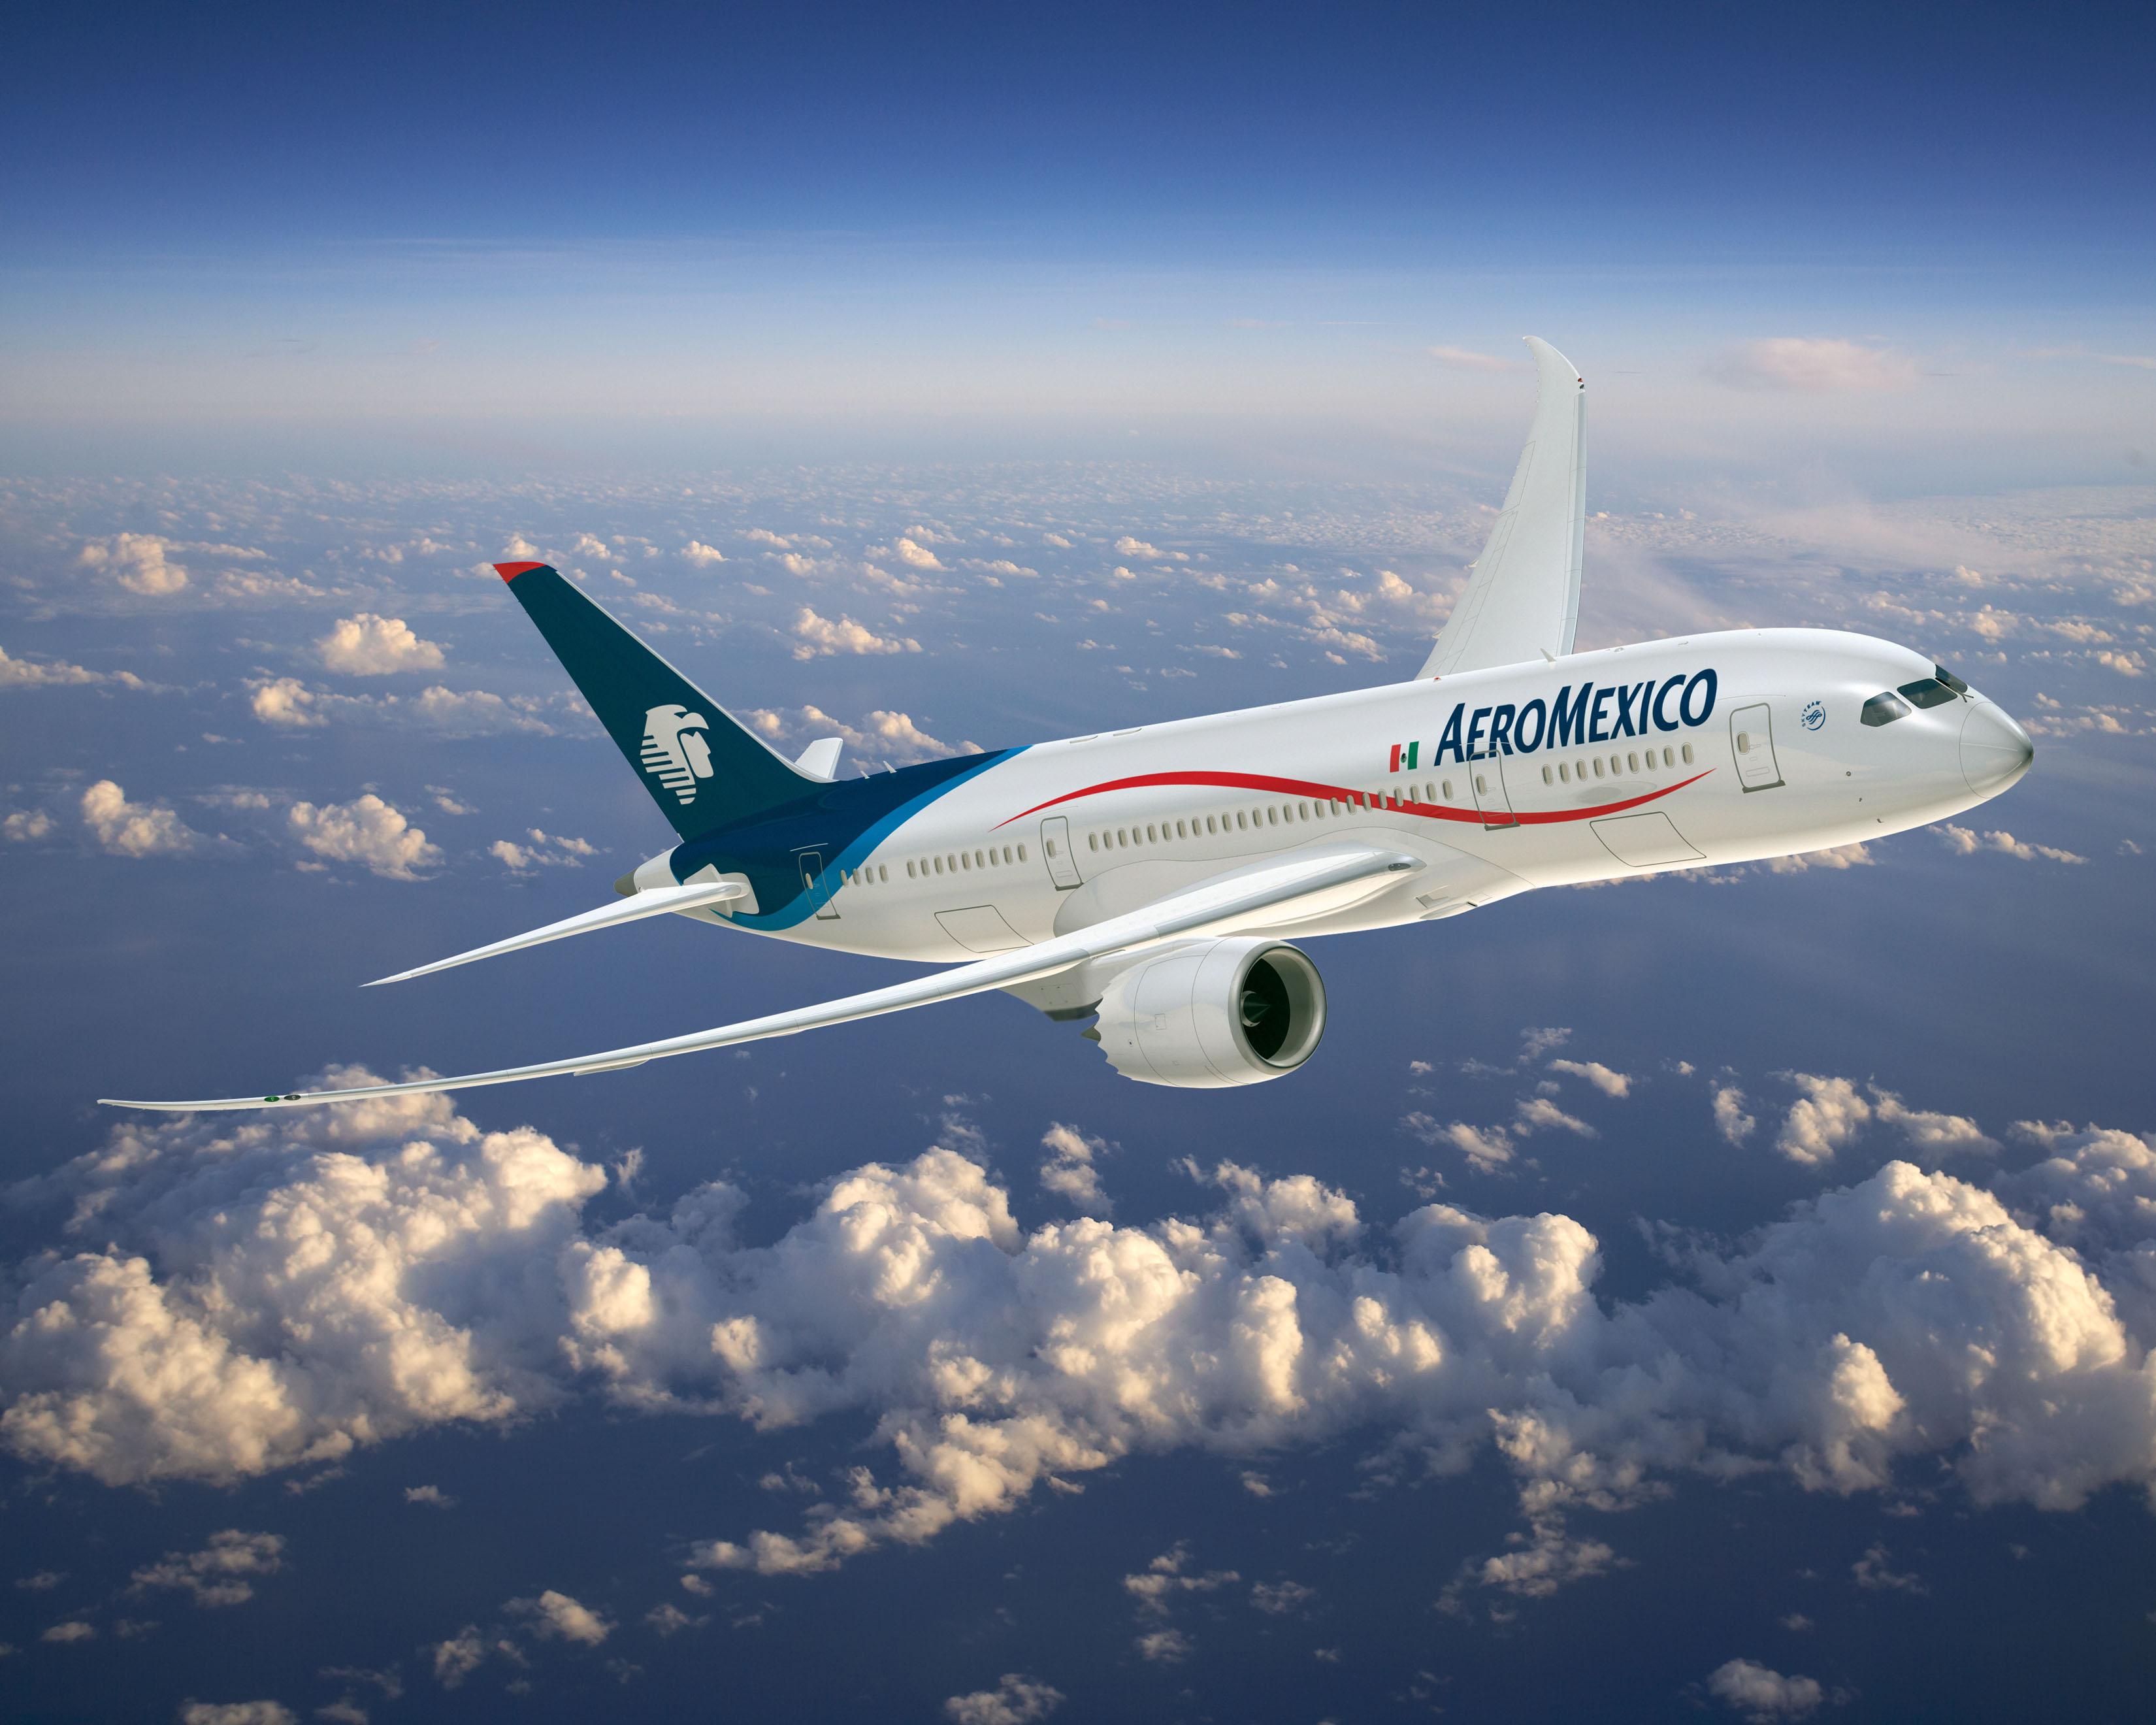 Aeromexico – 航空運輸翻訳